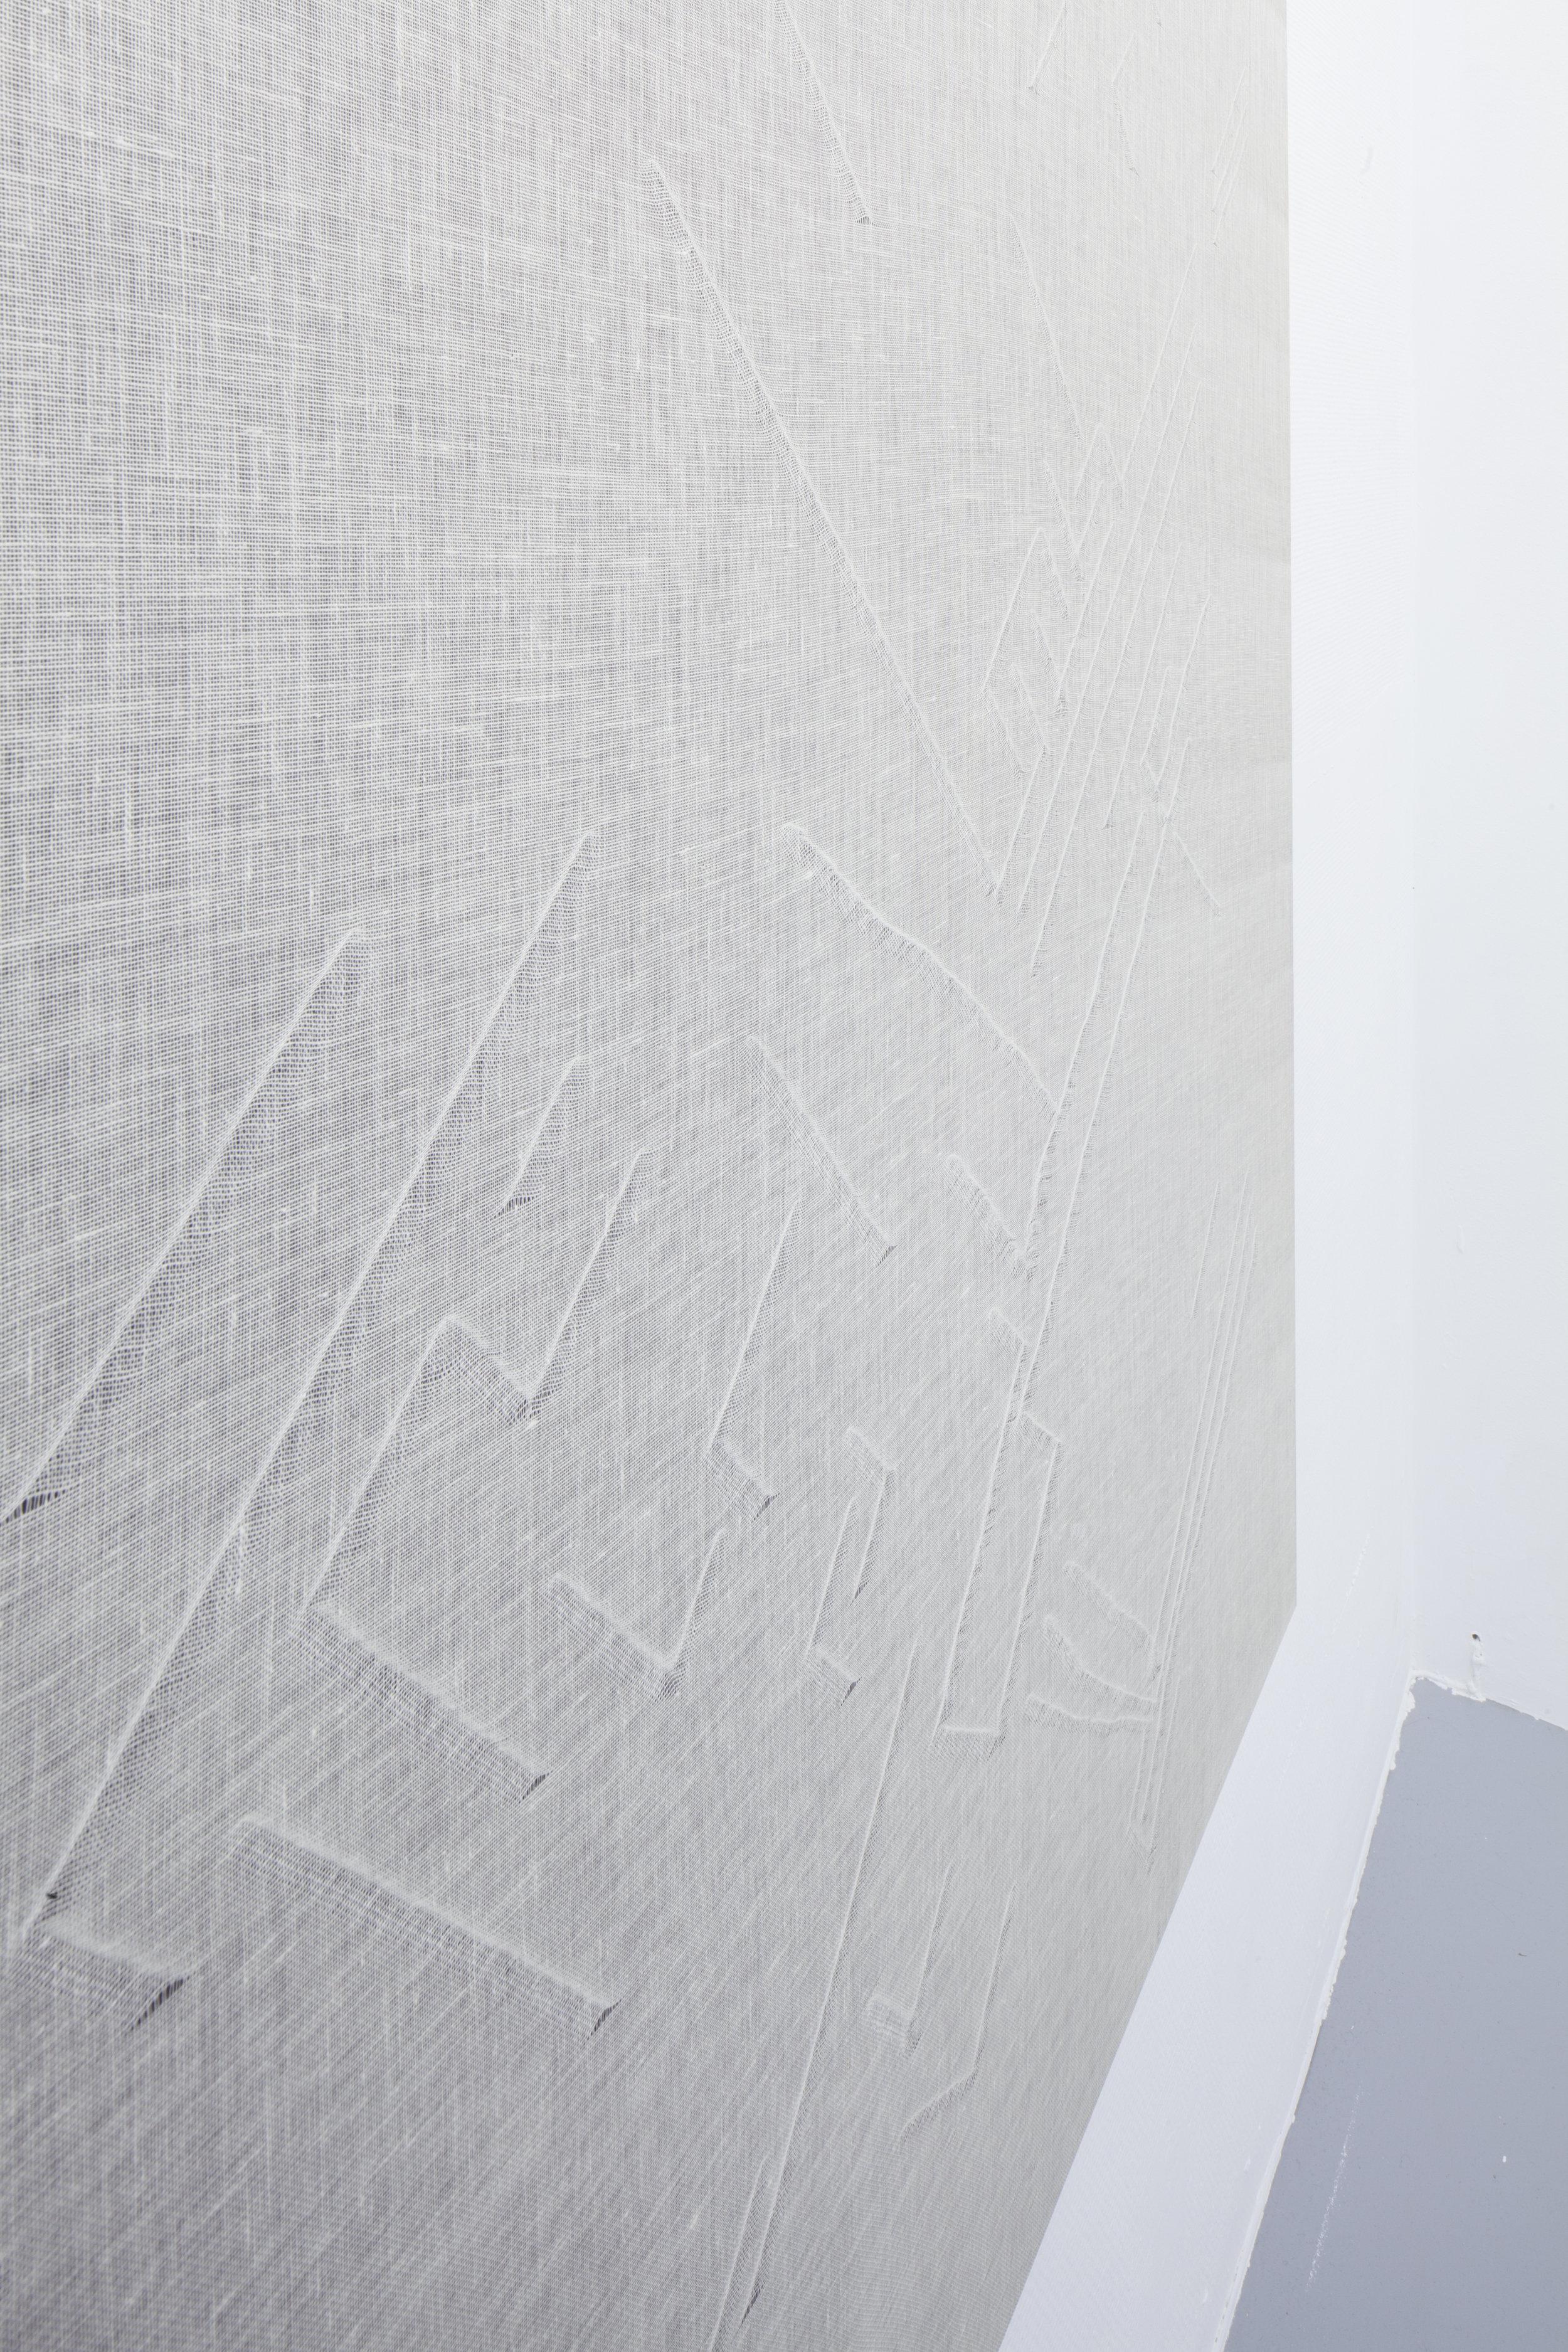 detail, Cortex, muslin fabric, cotton canvas wooden frame, 2016